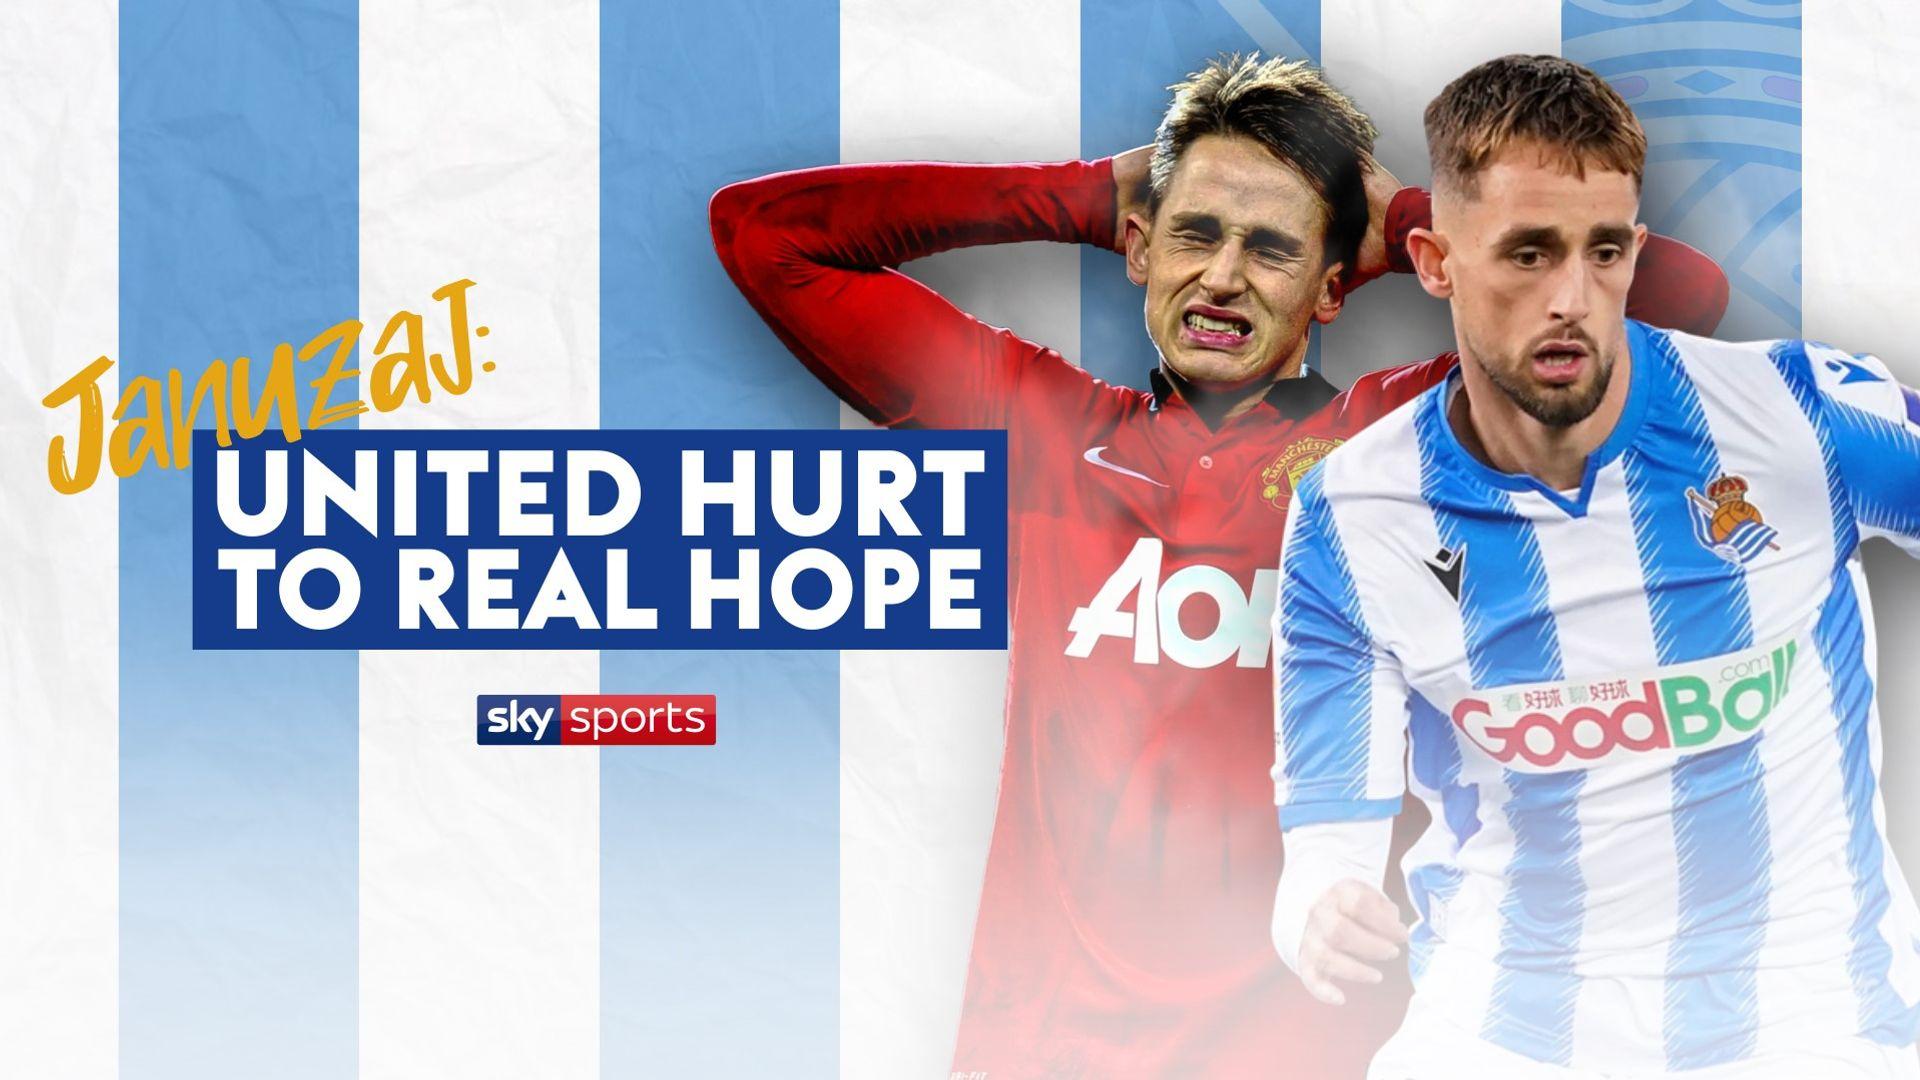 Januzaj - Man Utd hurt to Sociedad hope